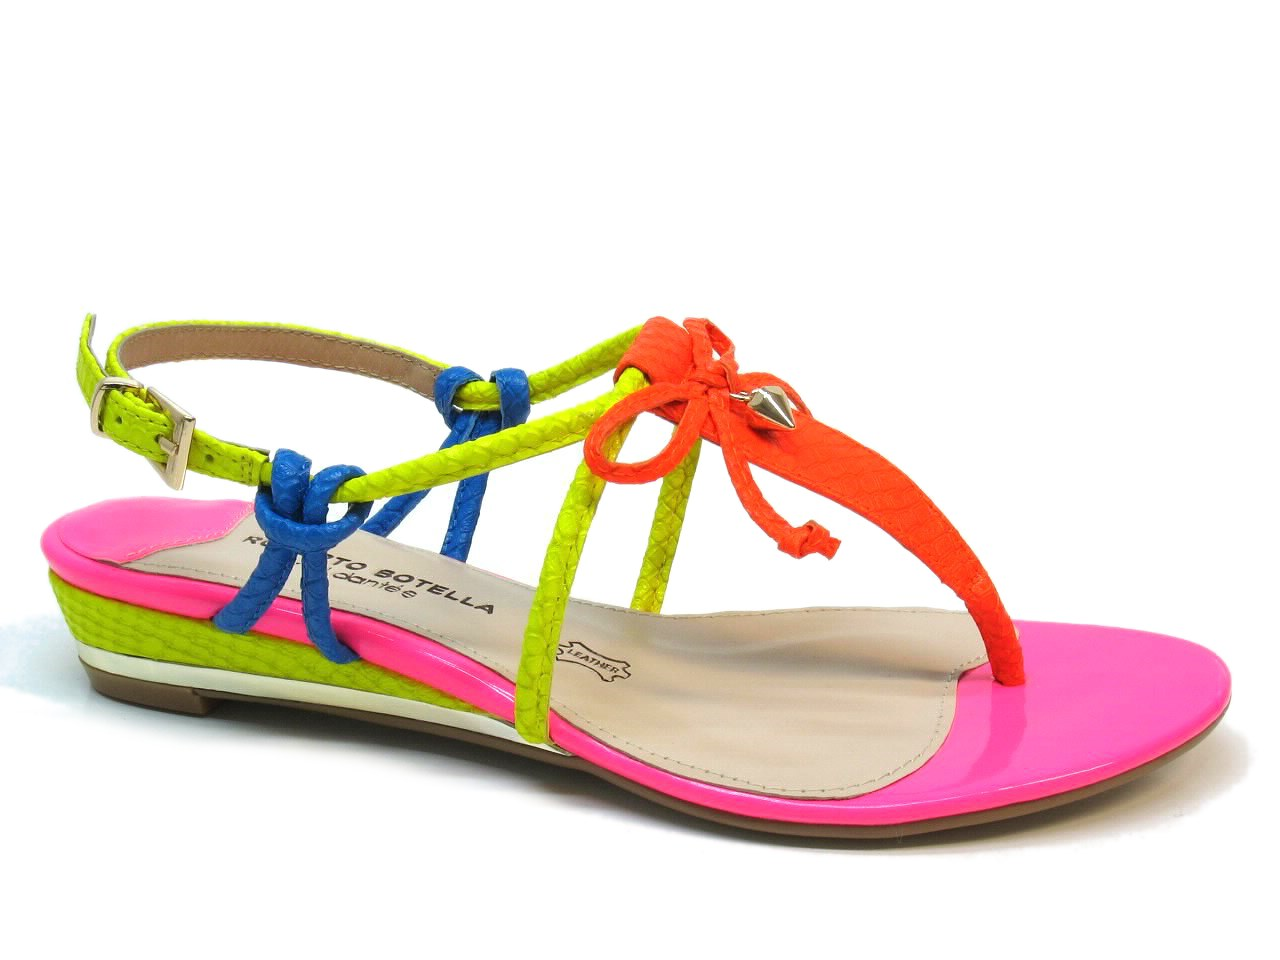 Sandalias de Cuña Roberto Botella - 387 M13125